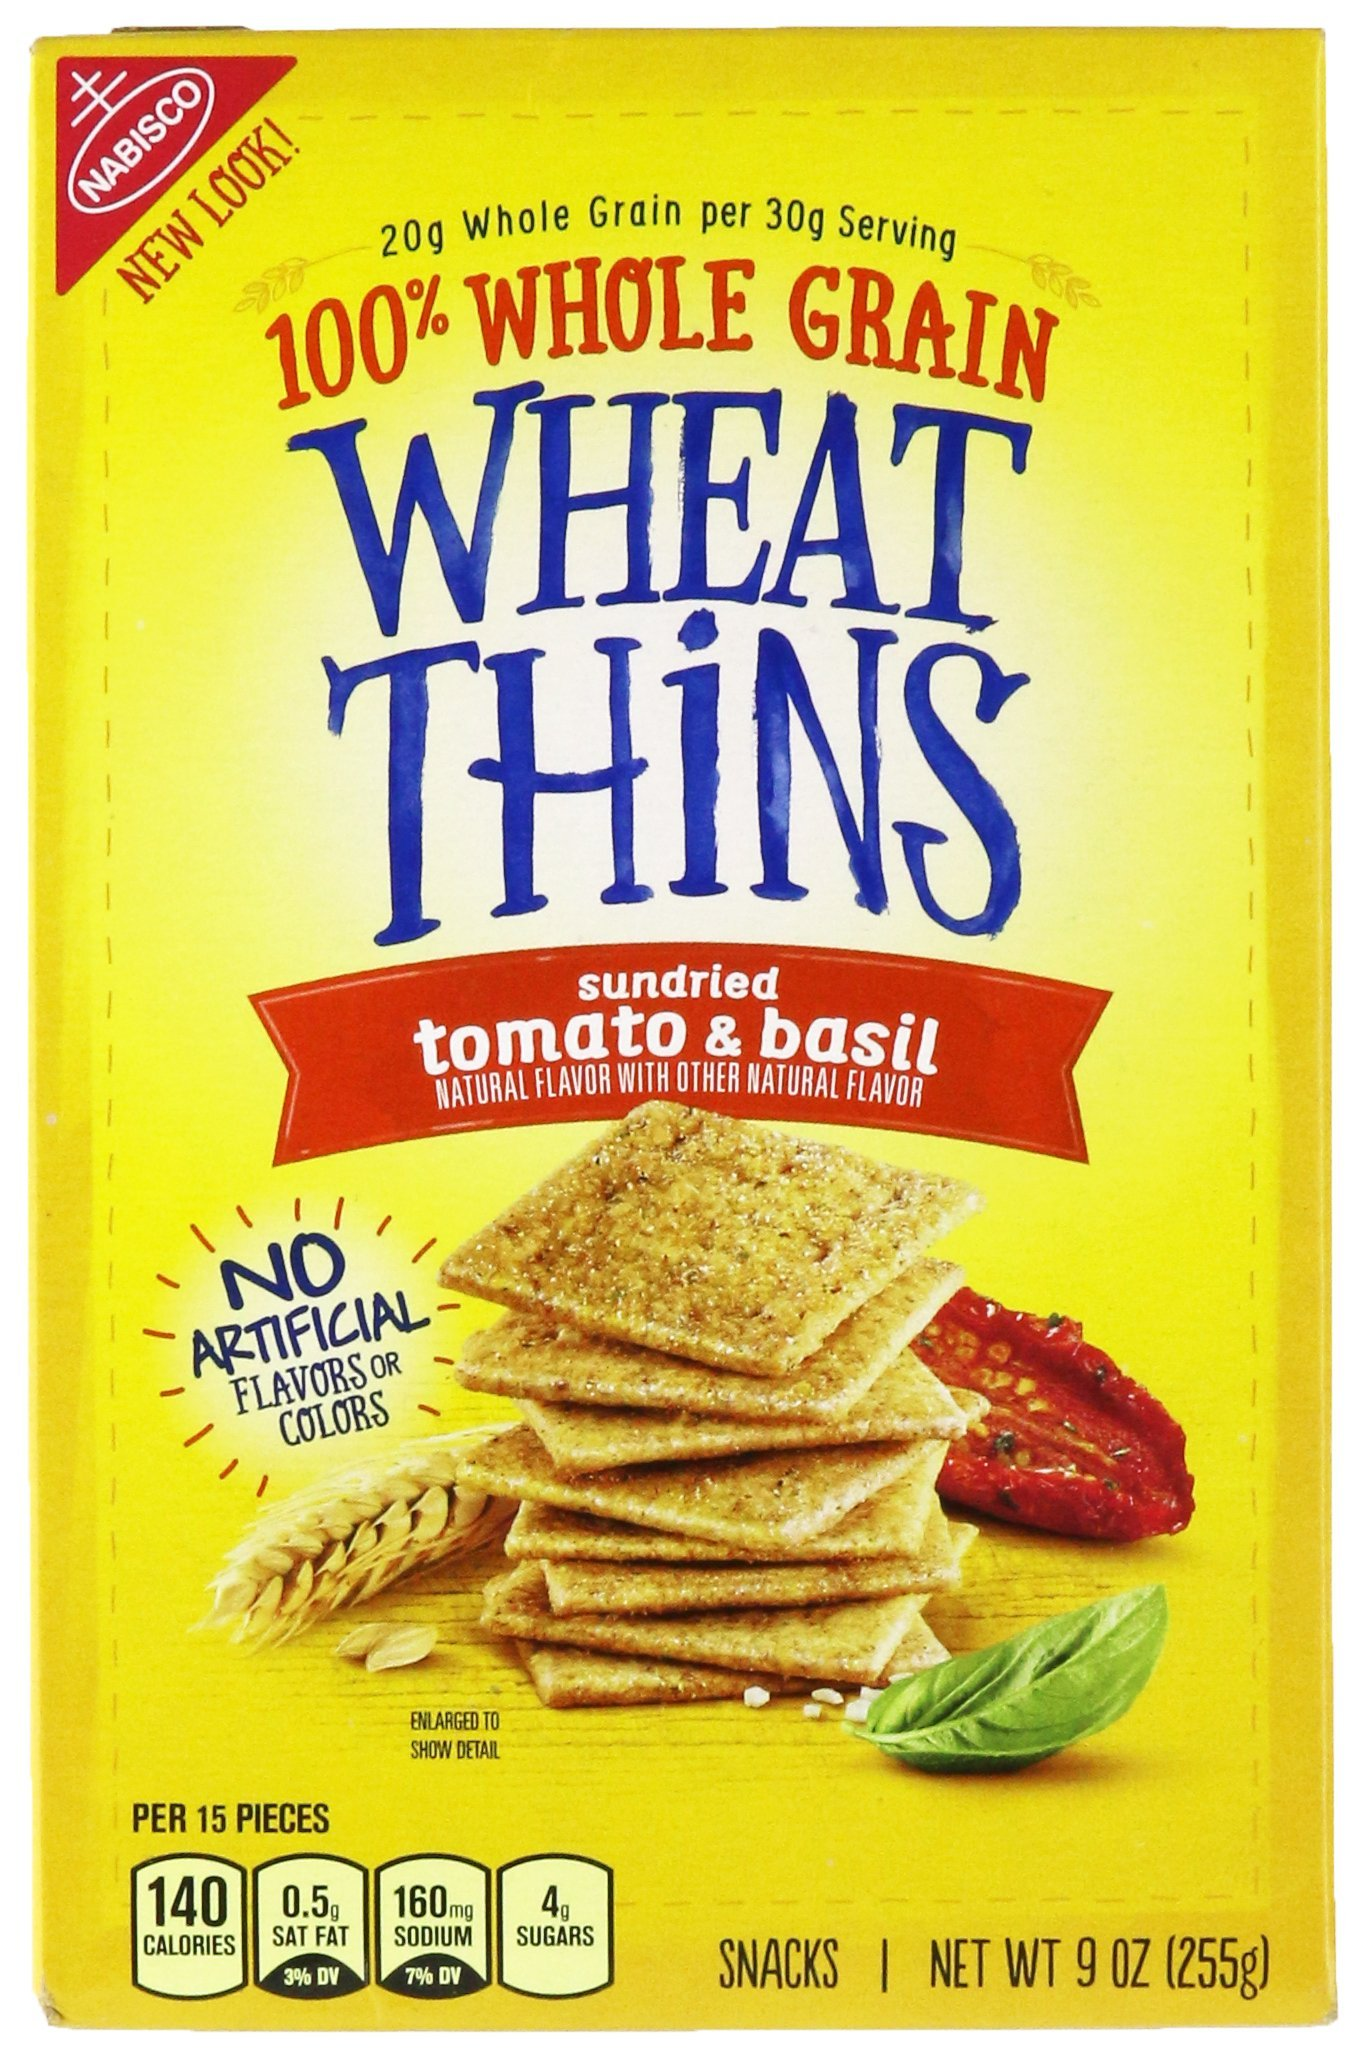 Wheat Thins, Sundried Tomato & Basil, 9 oz